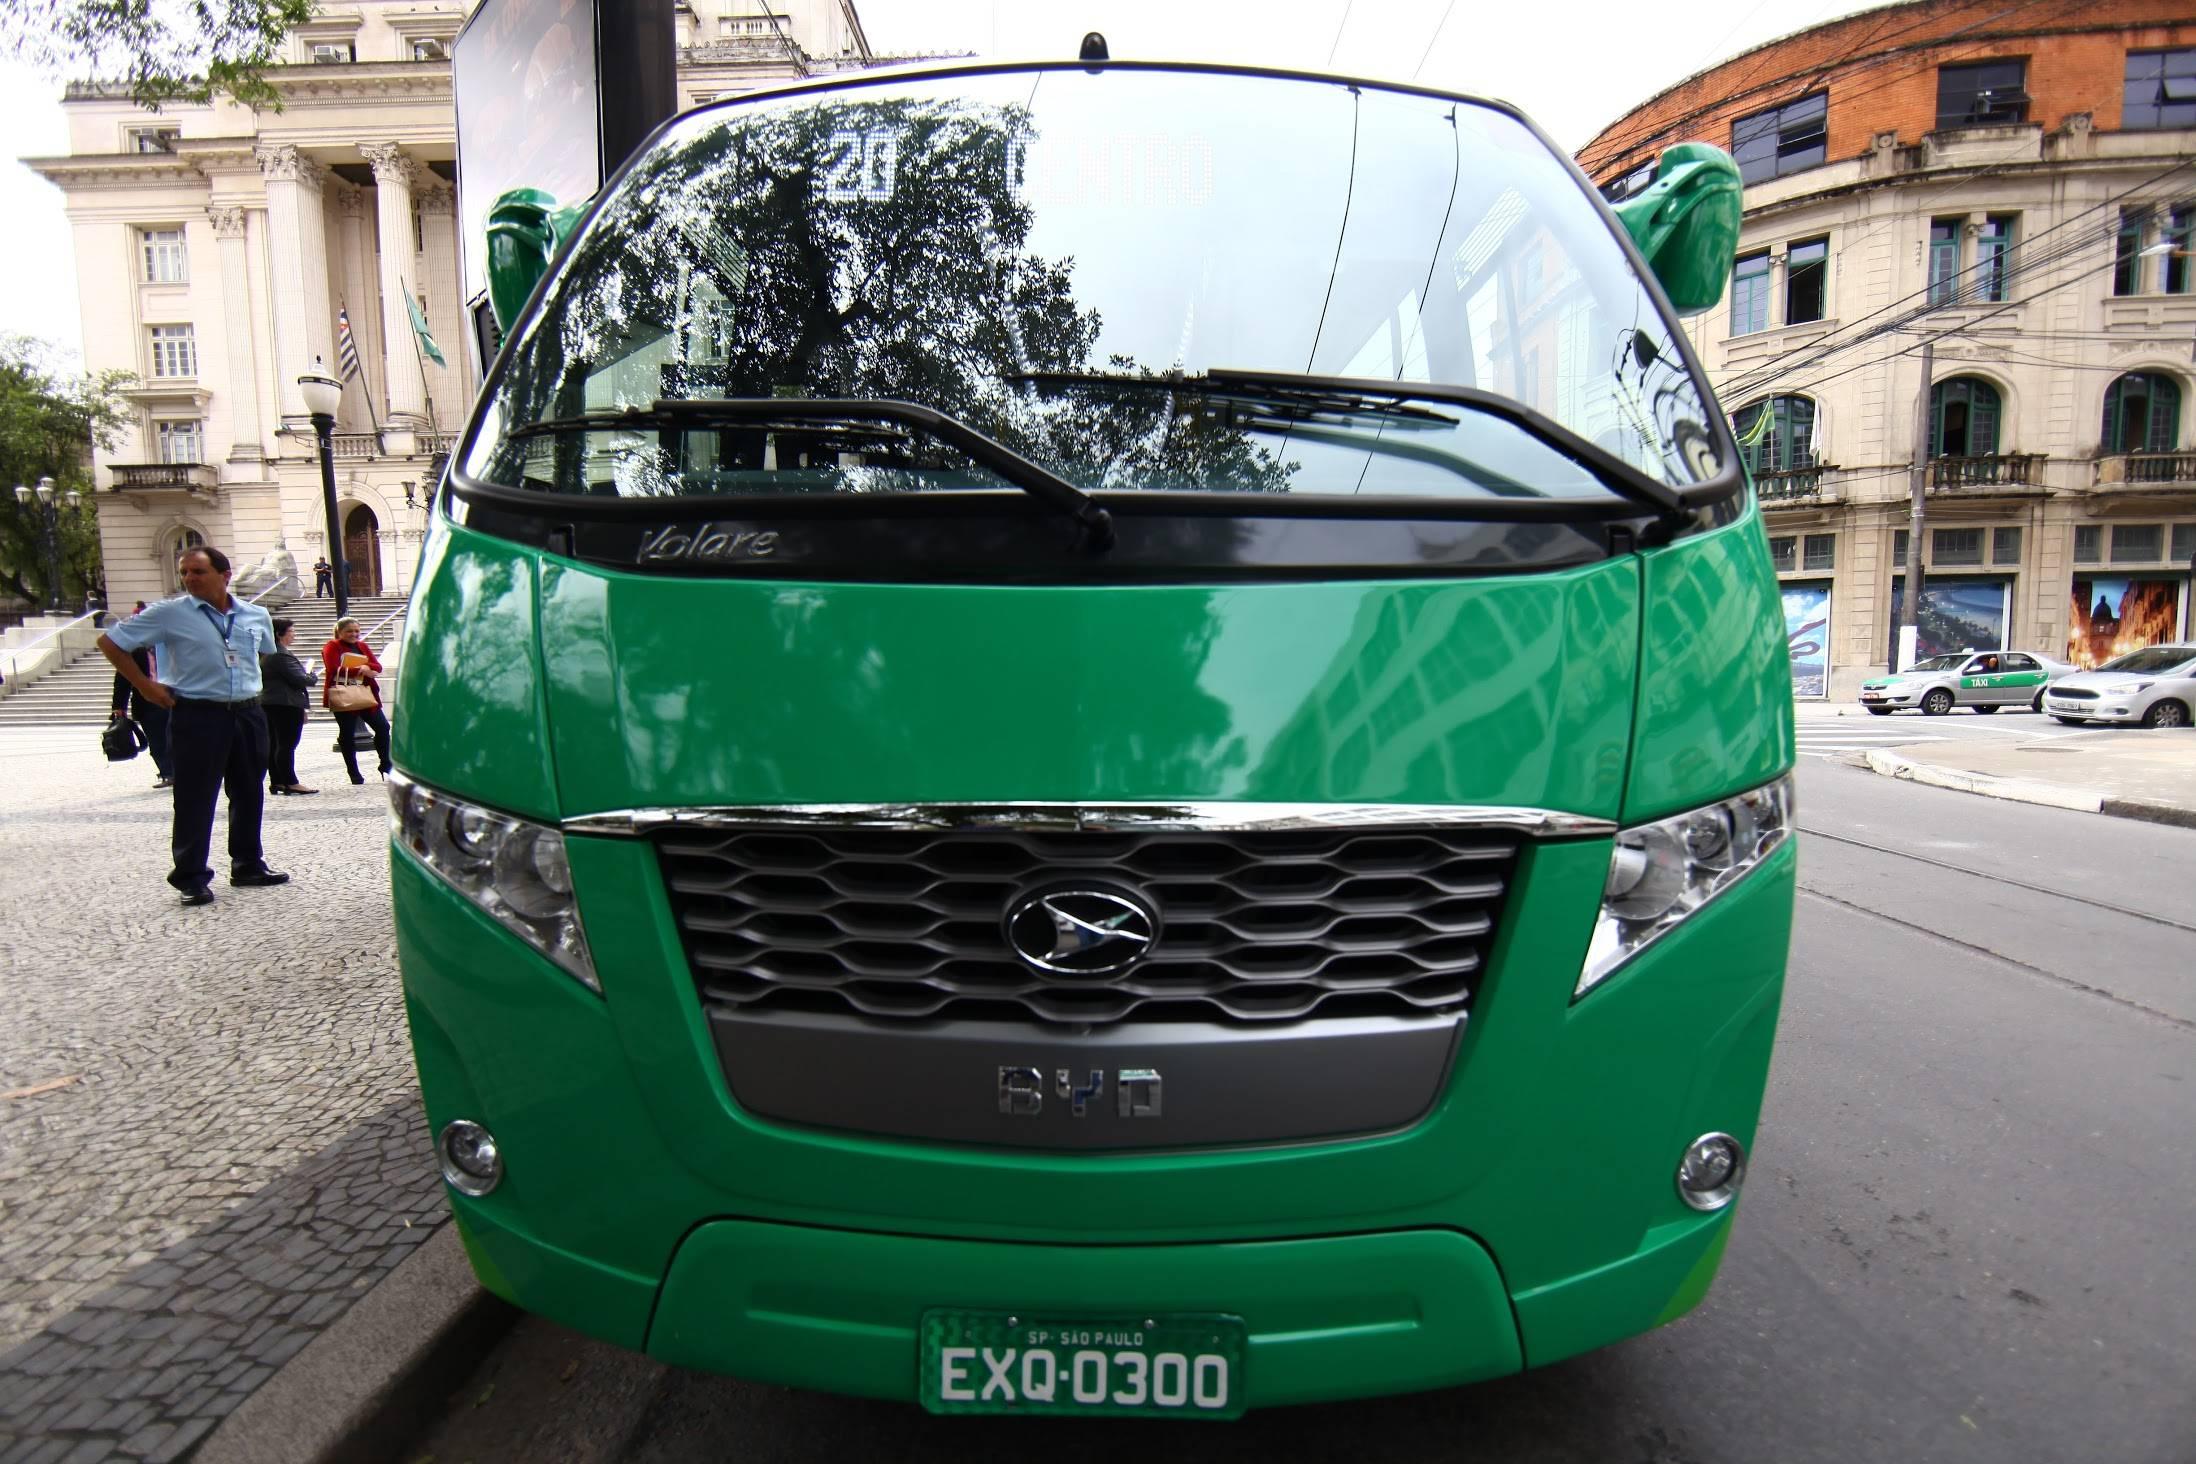 www.juicysantos.com.br - transporte público ecológico